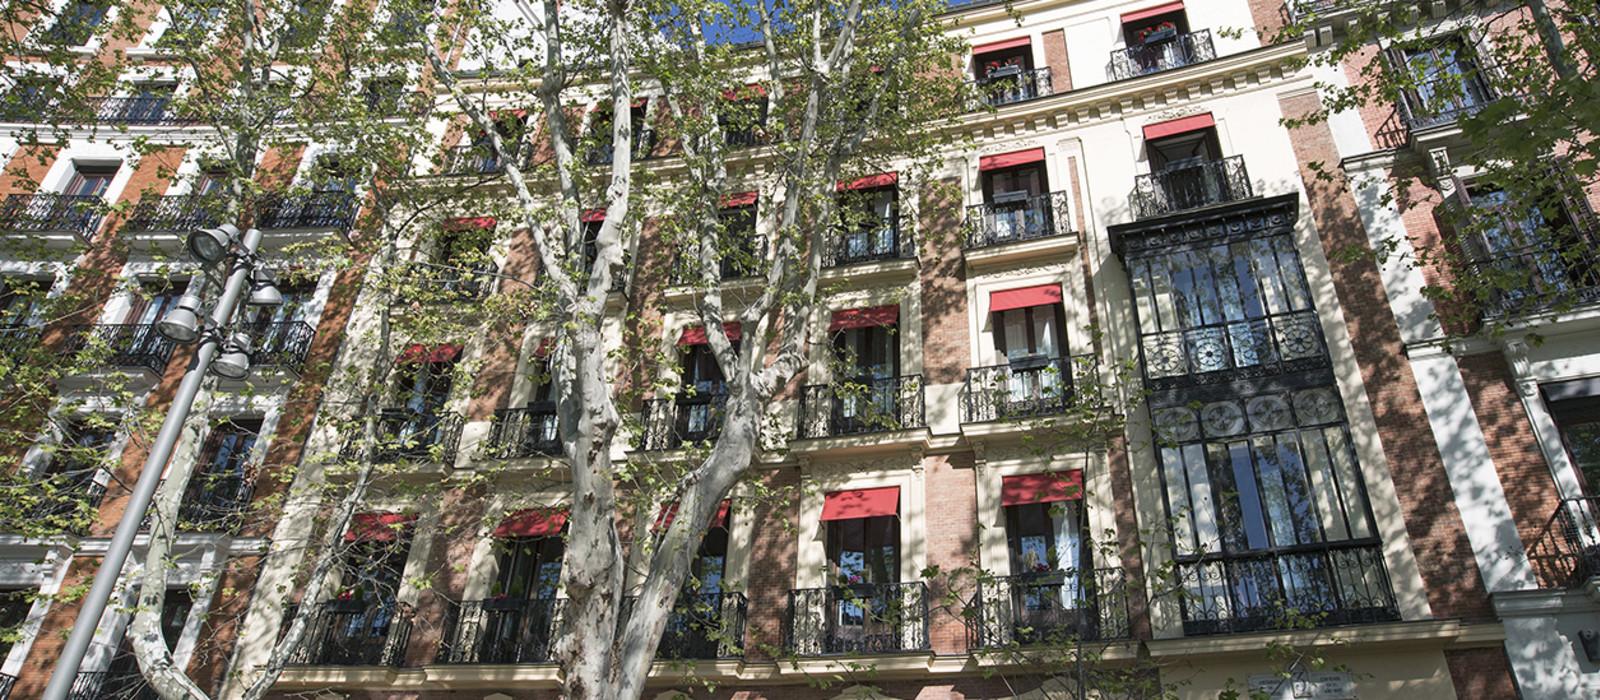 Hotel Hospes Puerta de Alcala Spanien